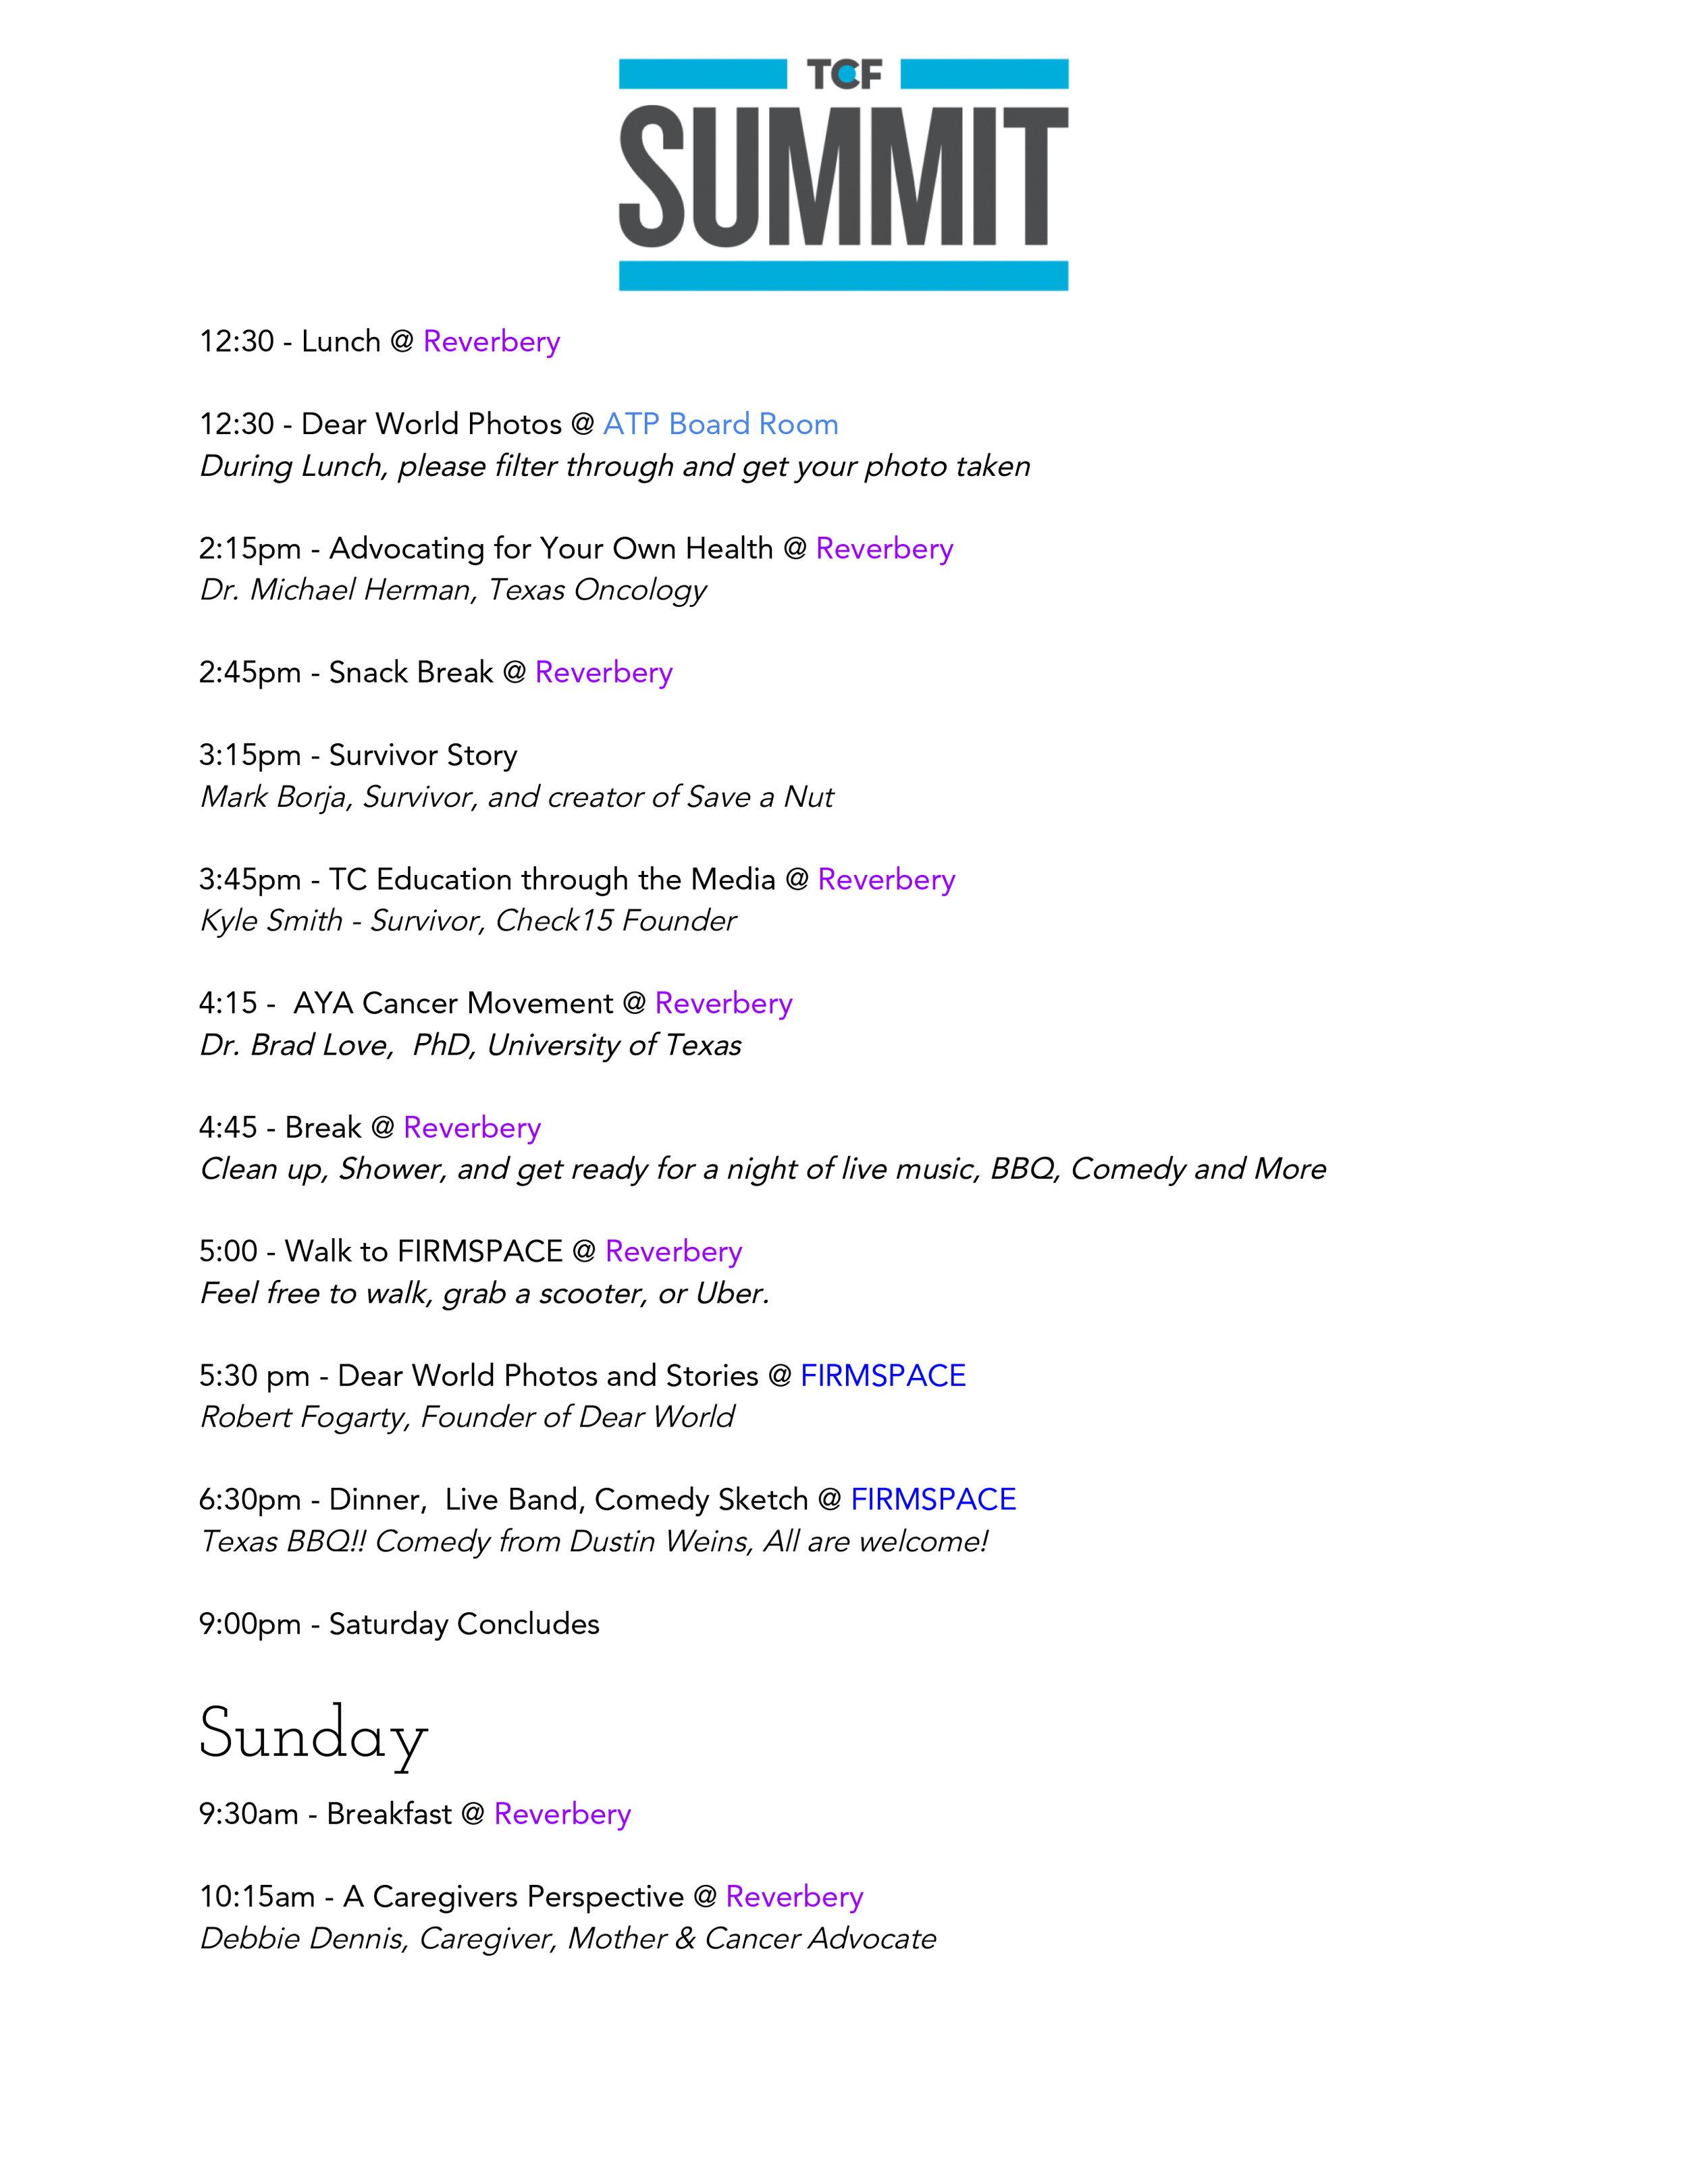 TCF Summit Agenda 2019-2.jpg